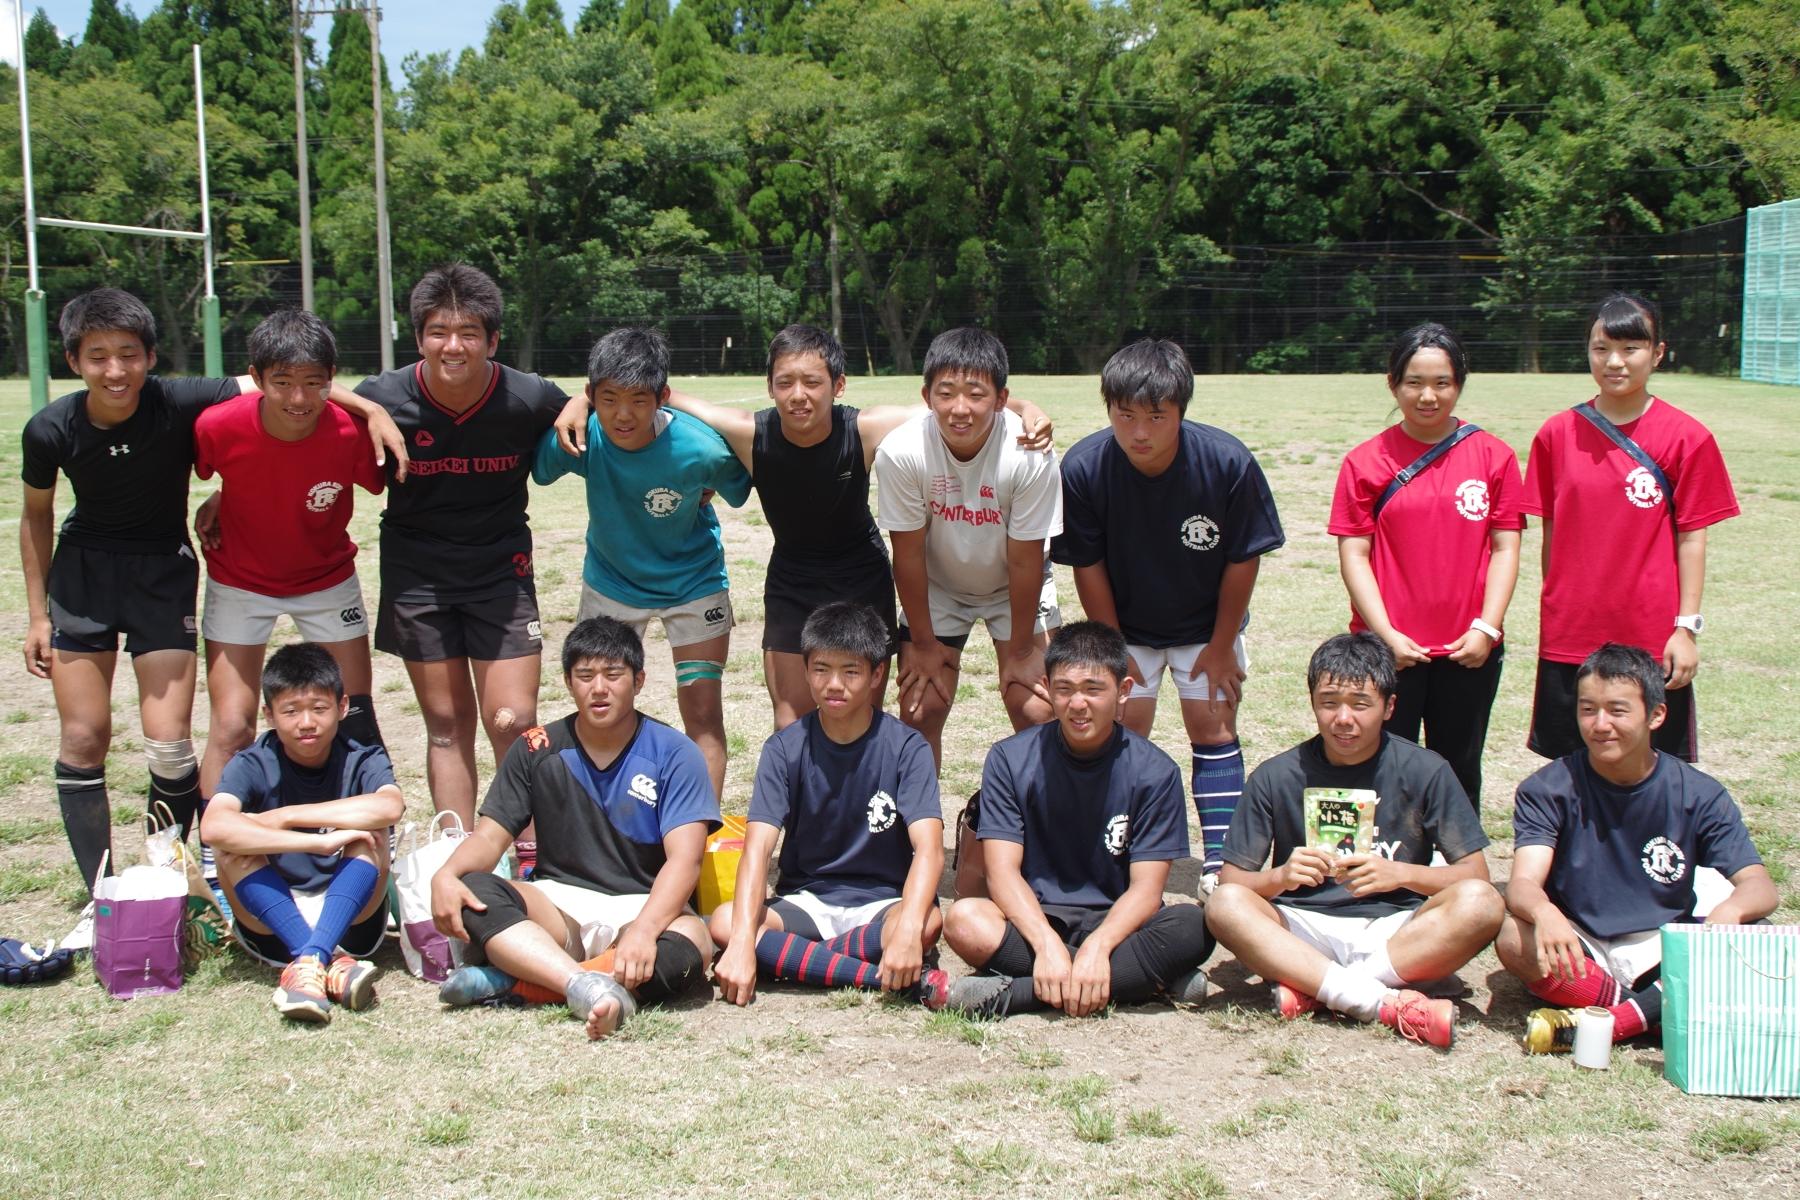 http://kokura-rugby.sakura.ne.jp/180814_115504_0826.jpg